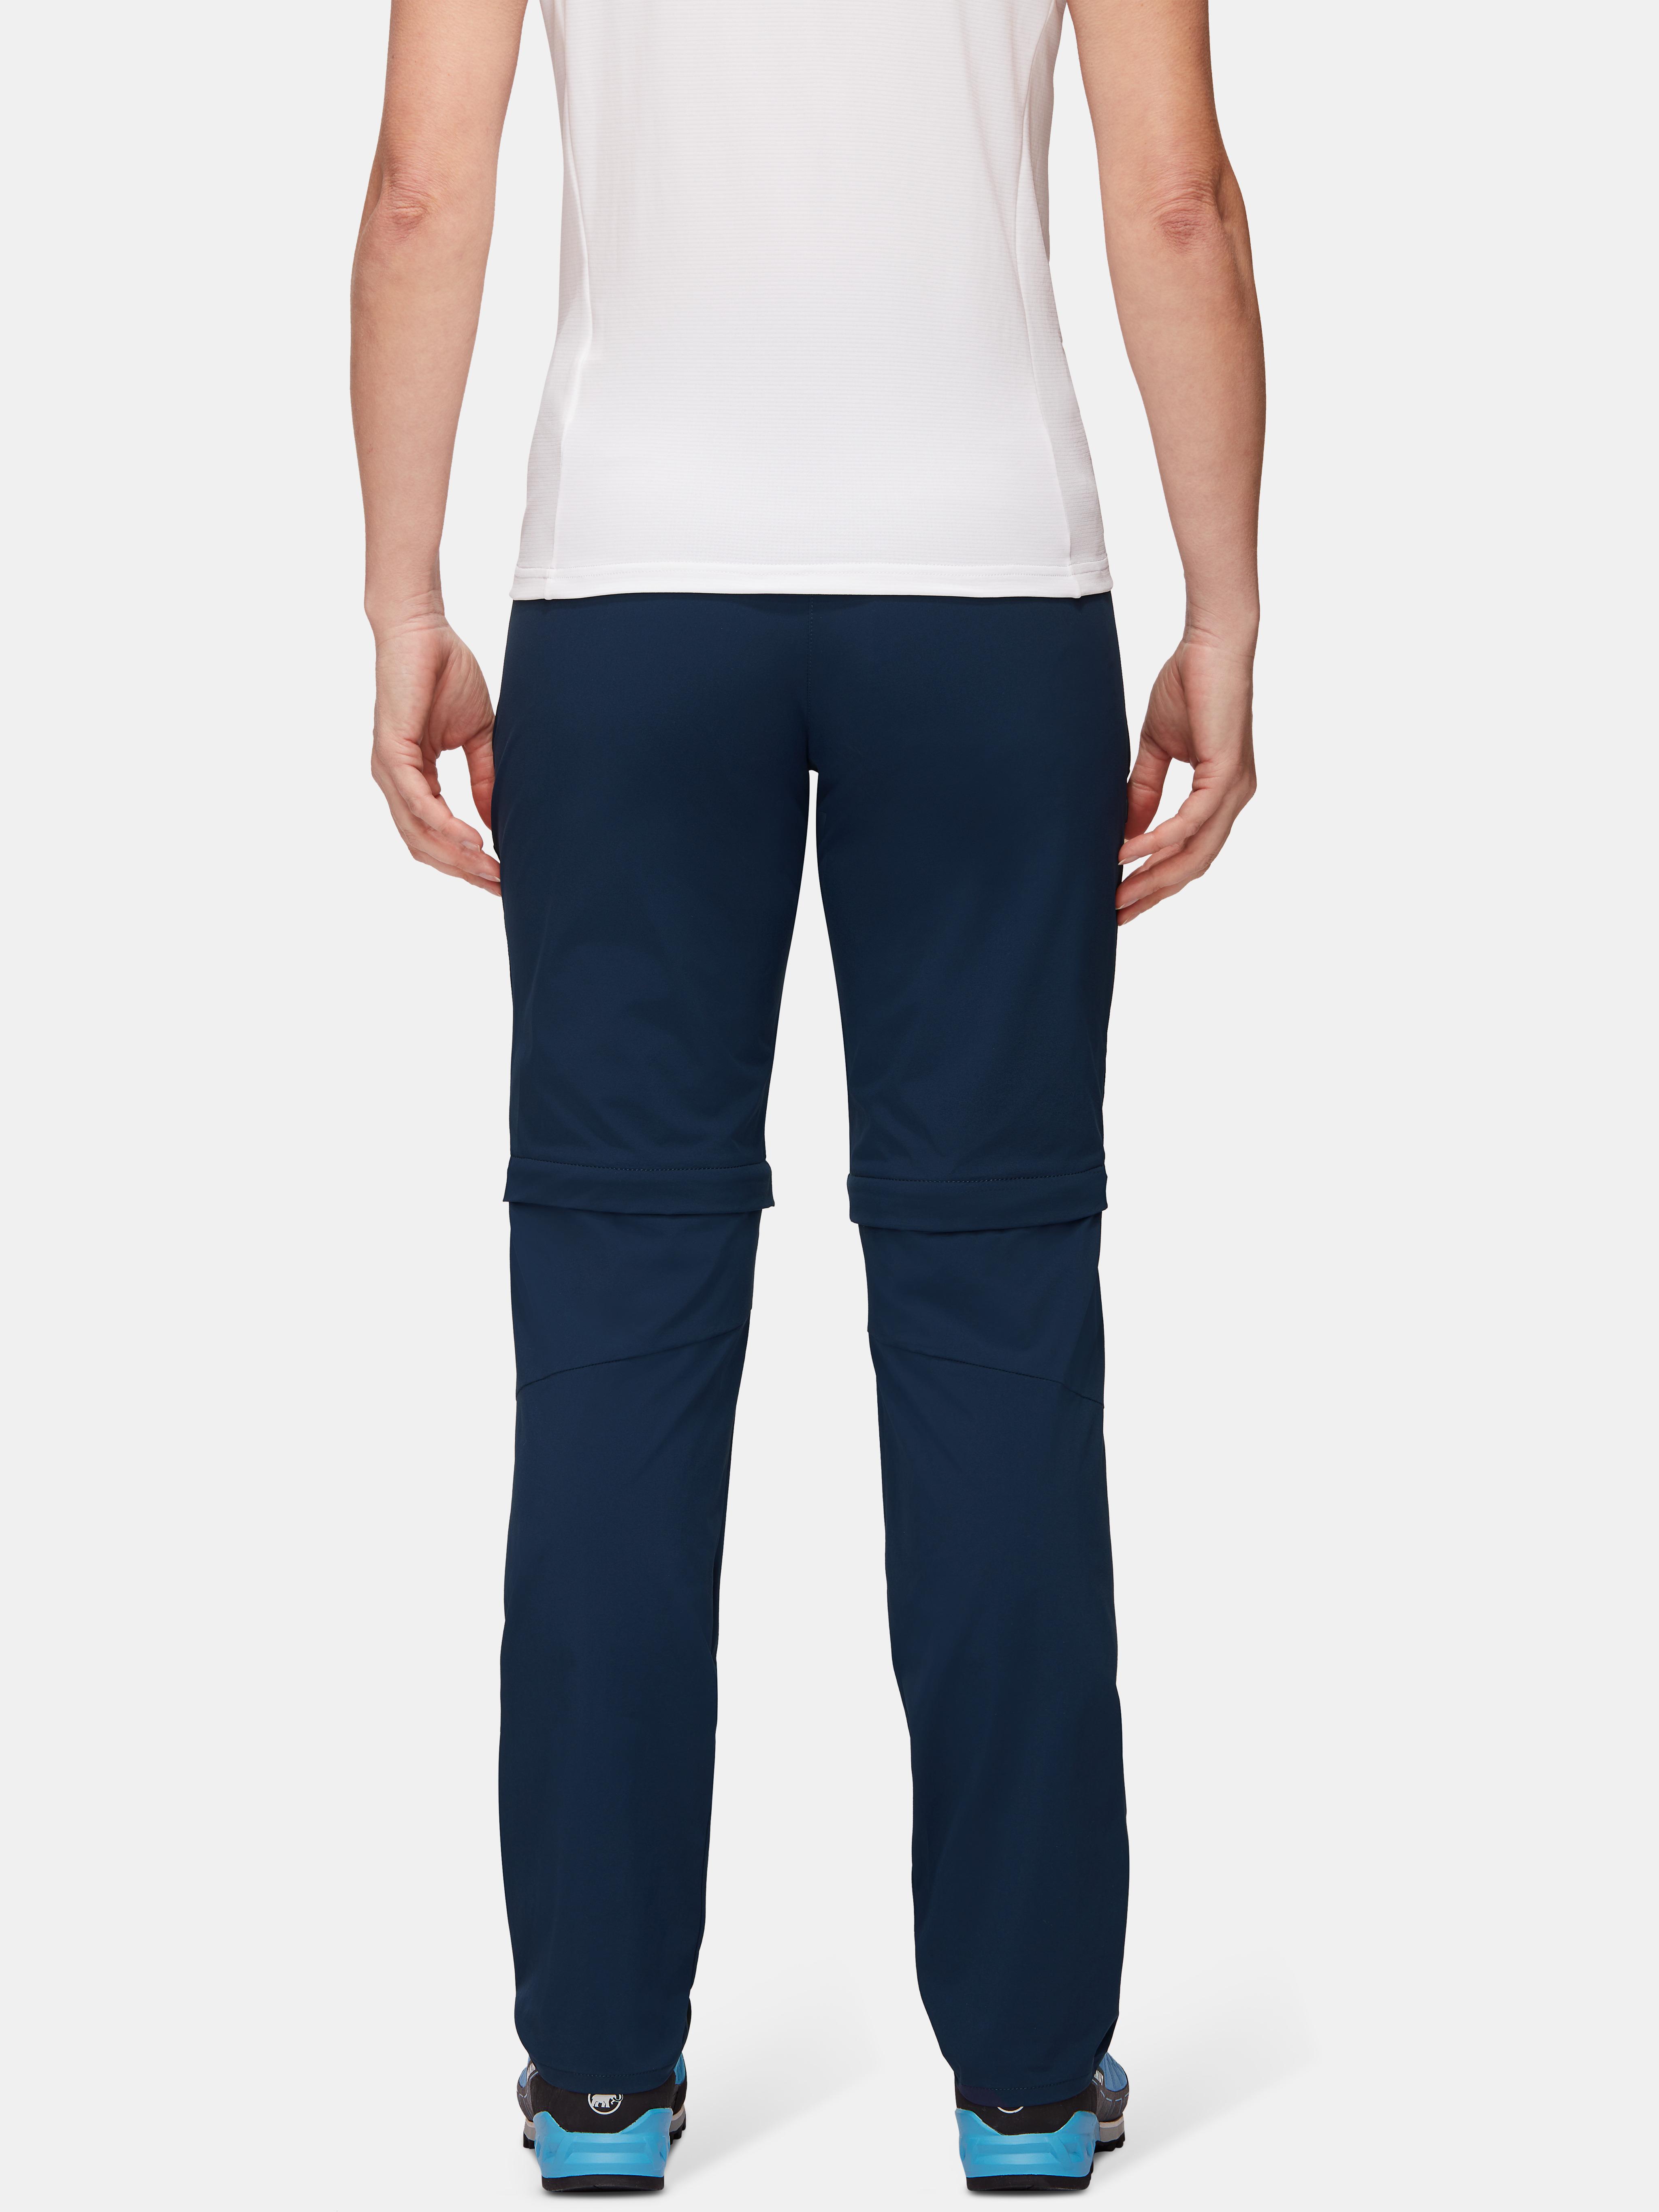 Runbold Zip Off Pants Women product image